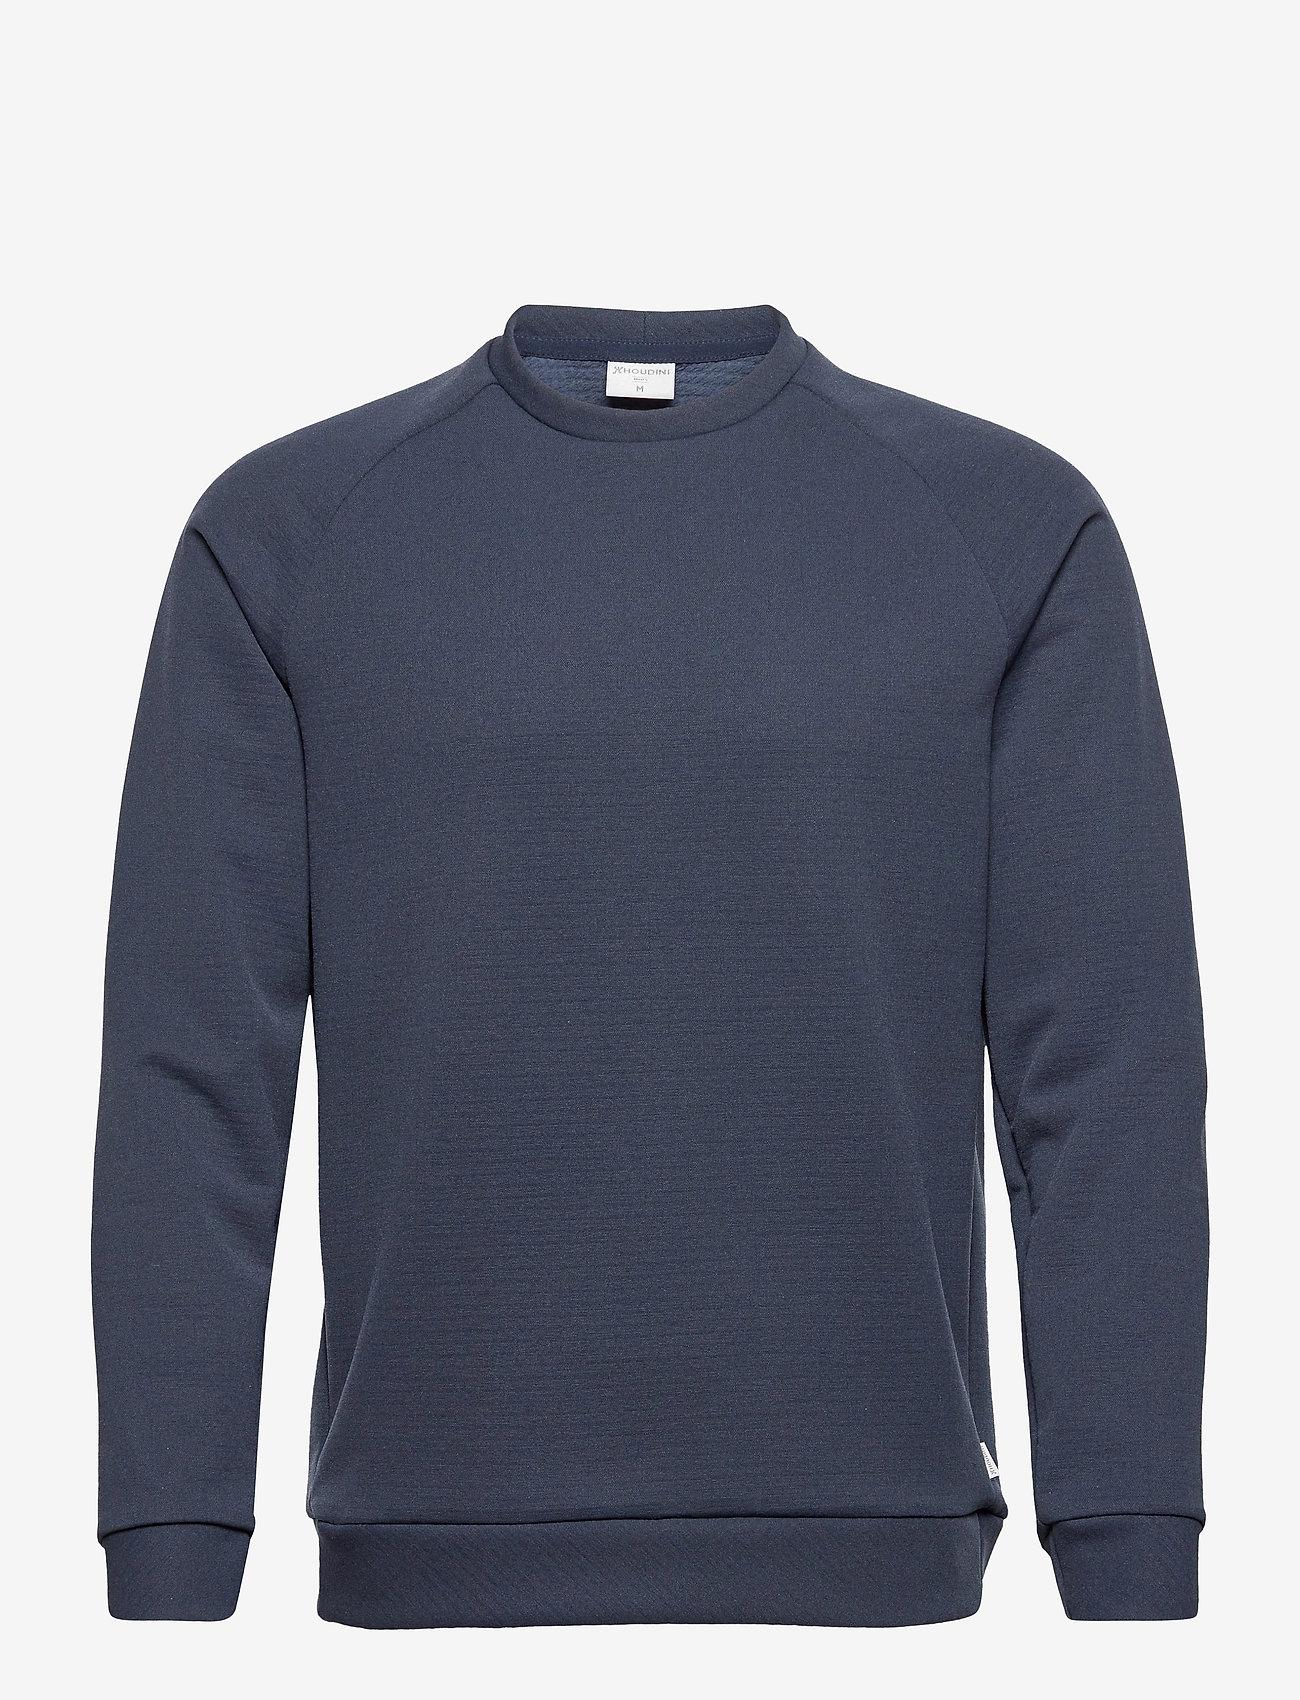 Houdini - M'sono Air Crew - basic-sweatshirts - blue illusion - 0